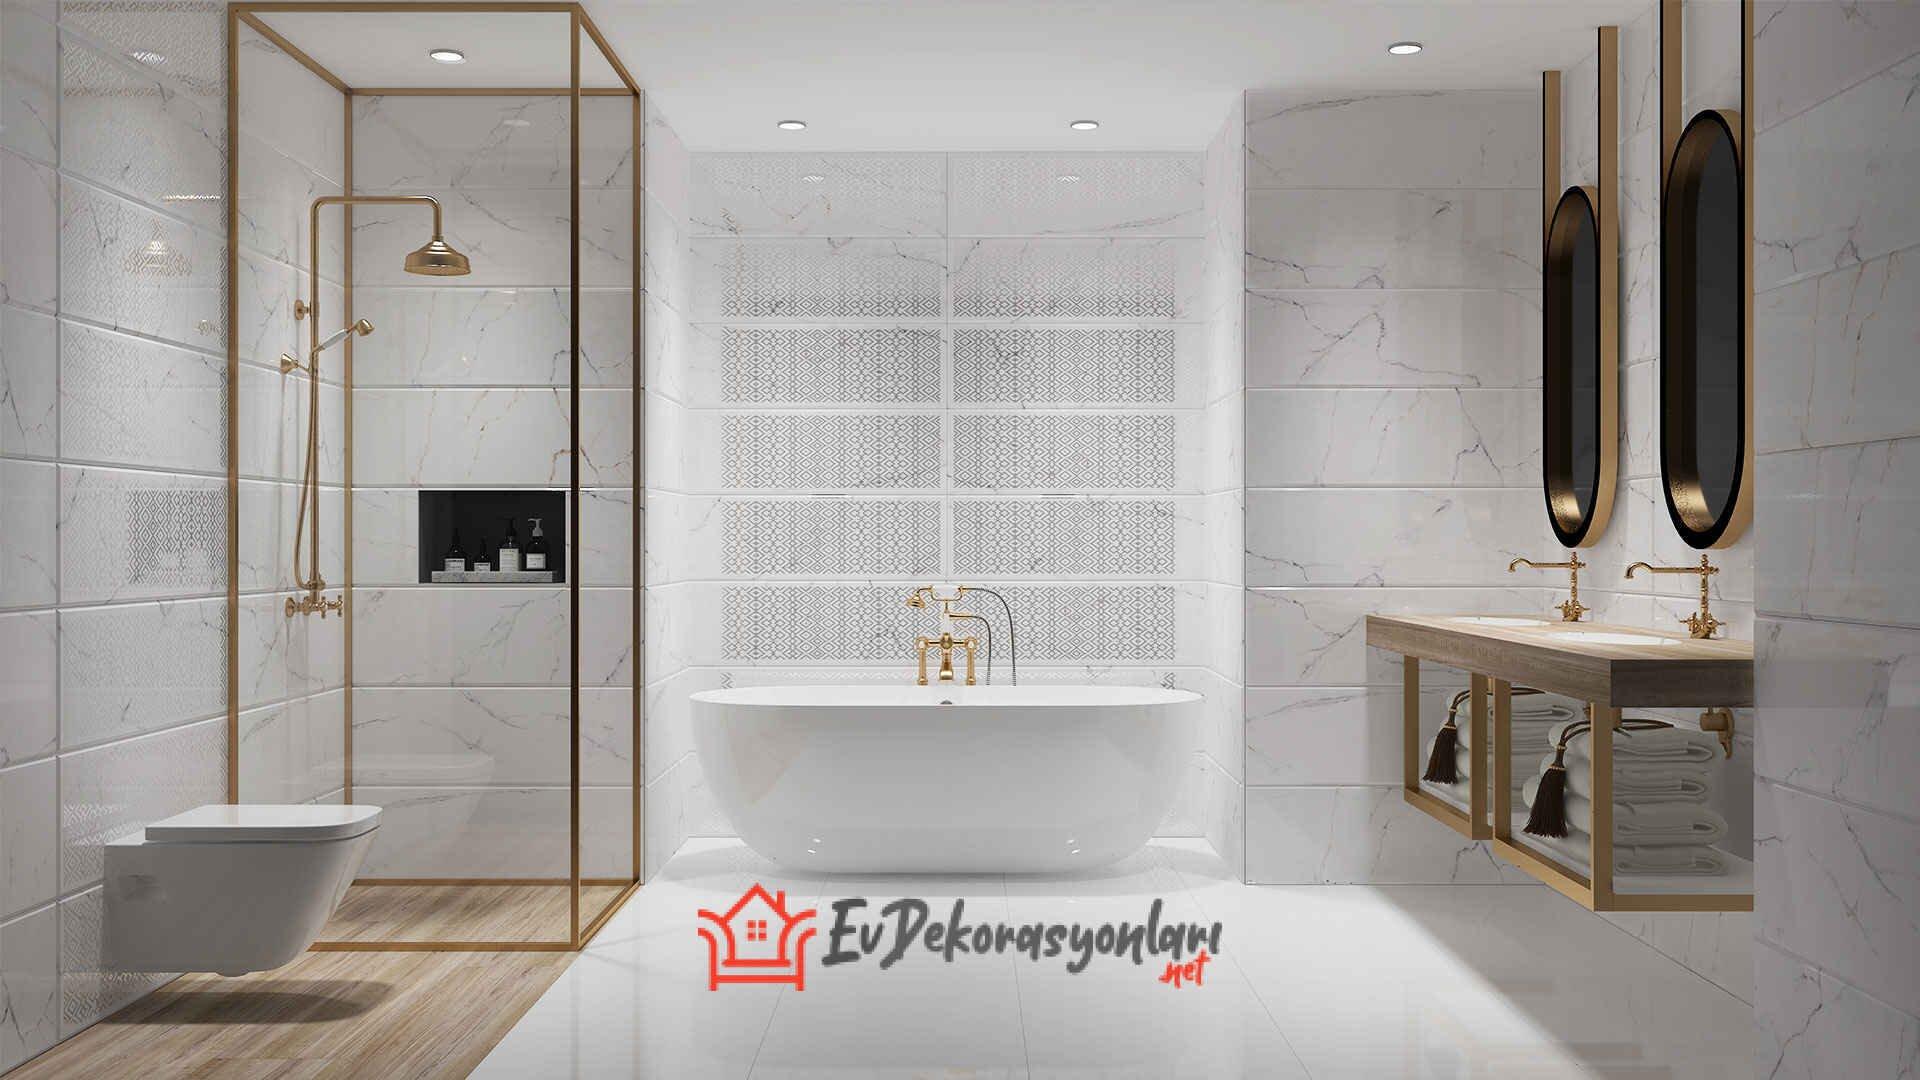 Banyo Farklı Fayans Modelleri